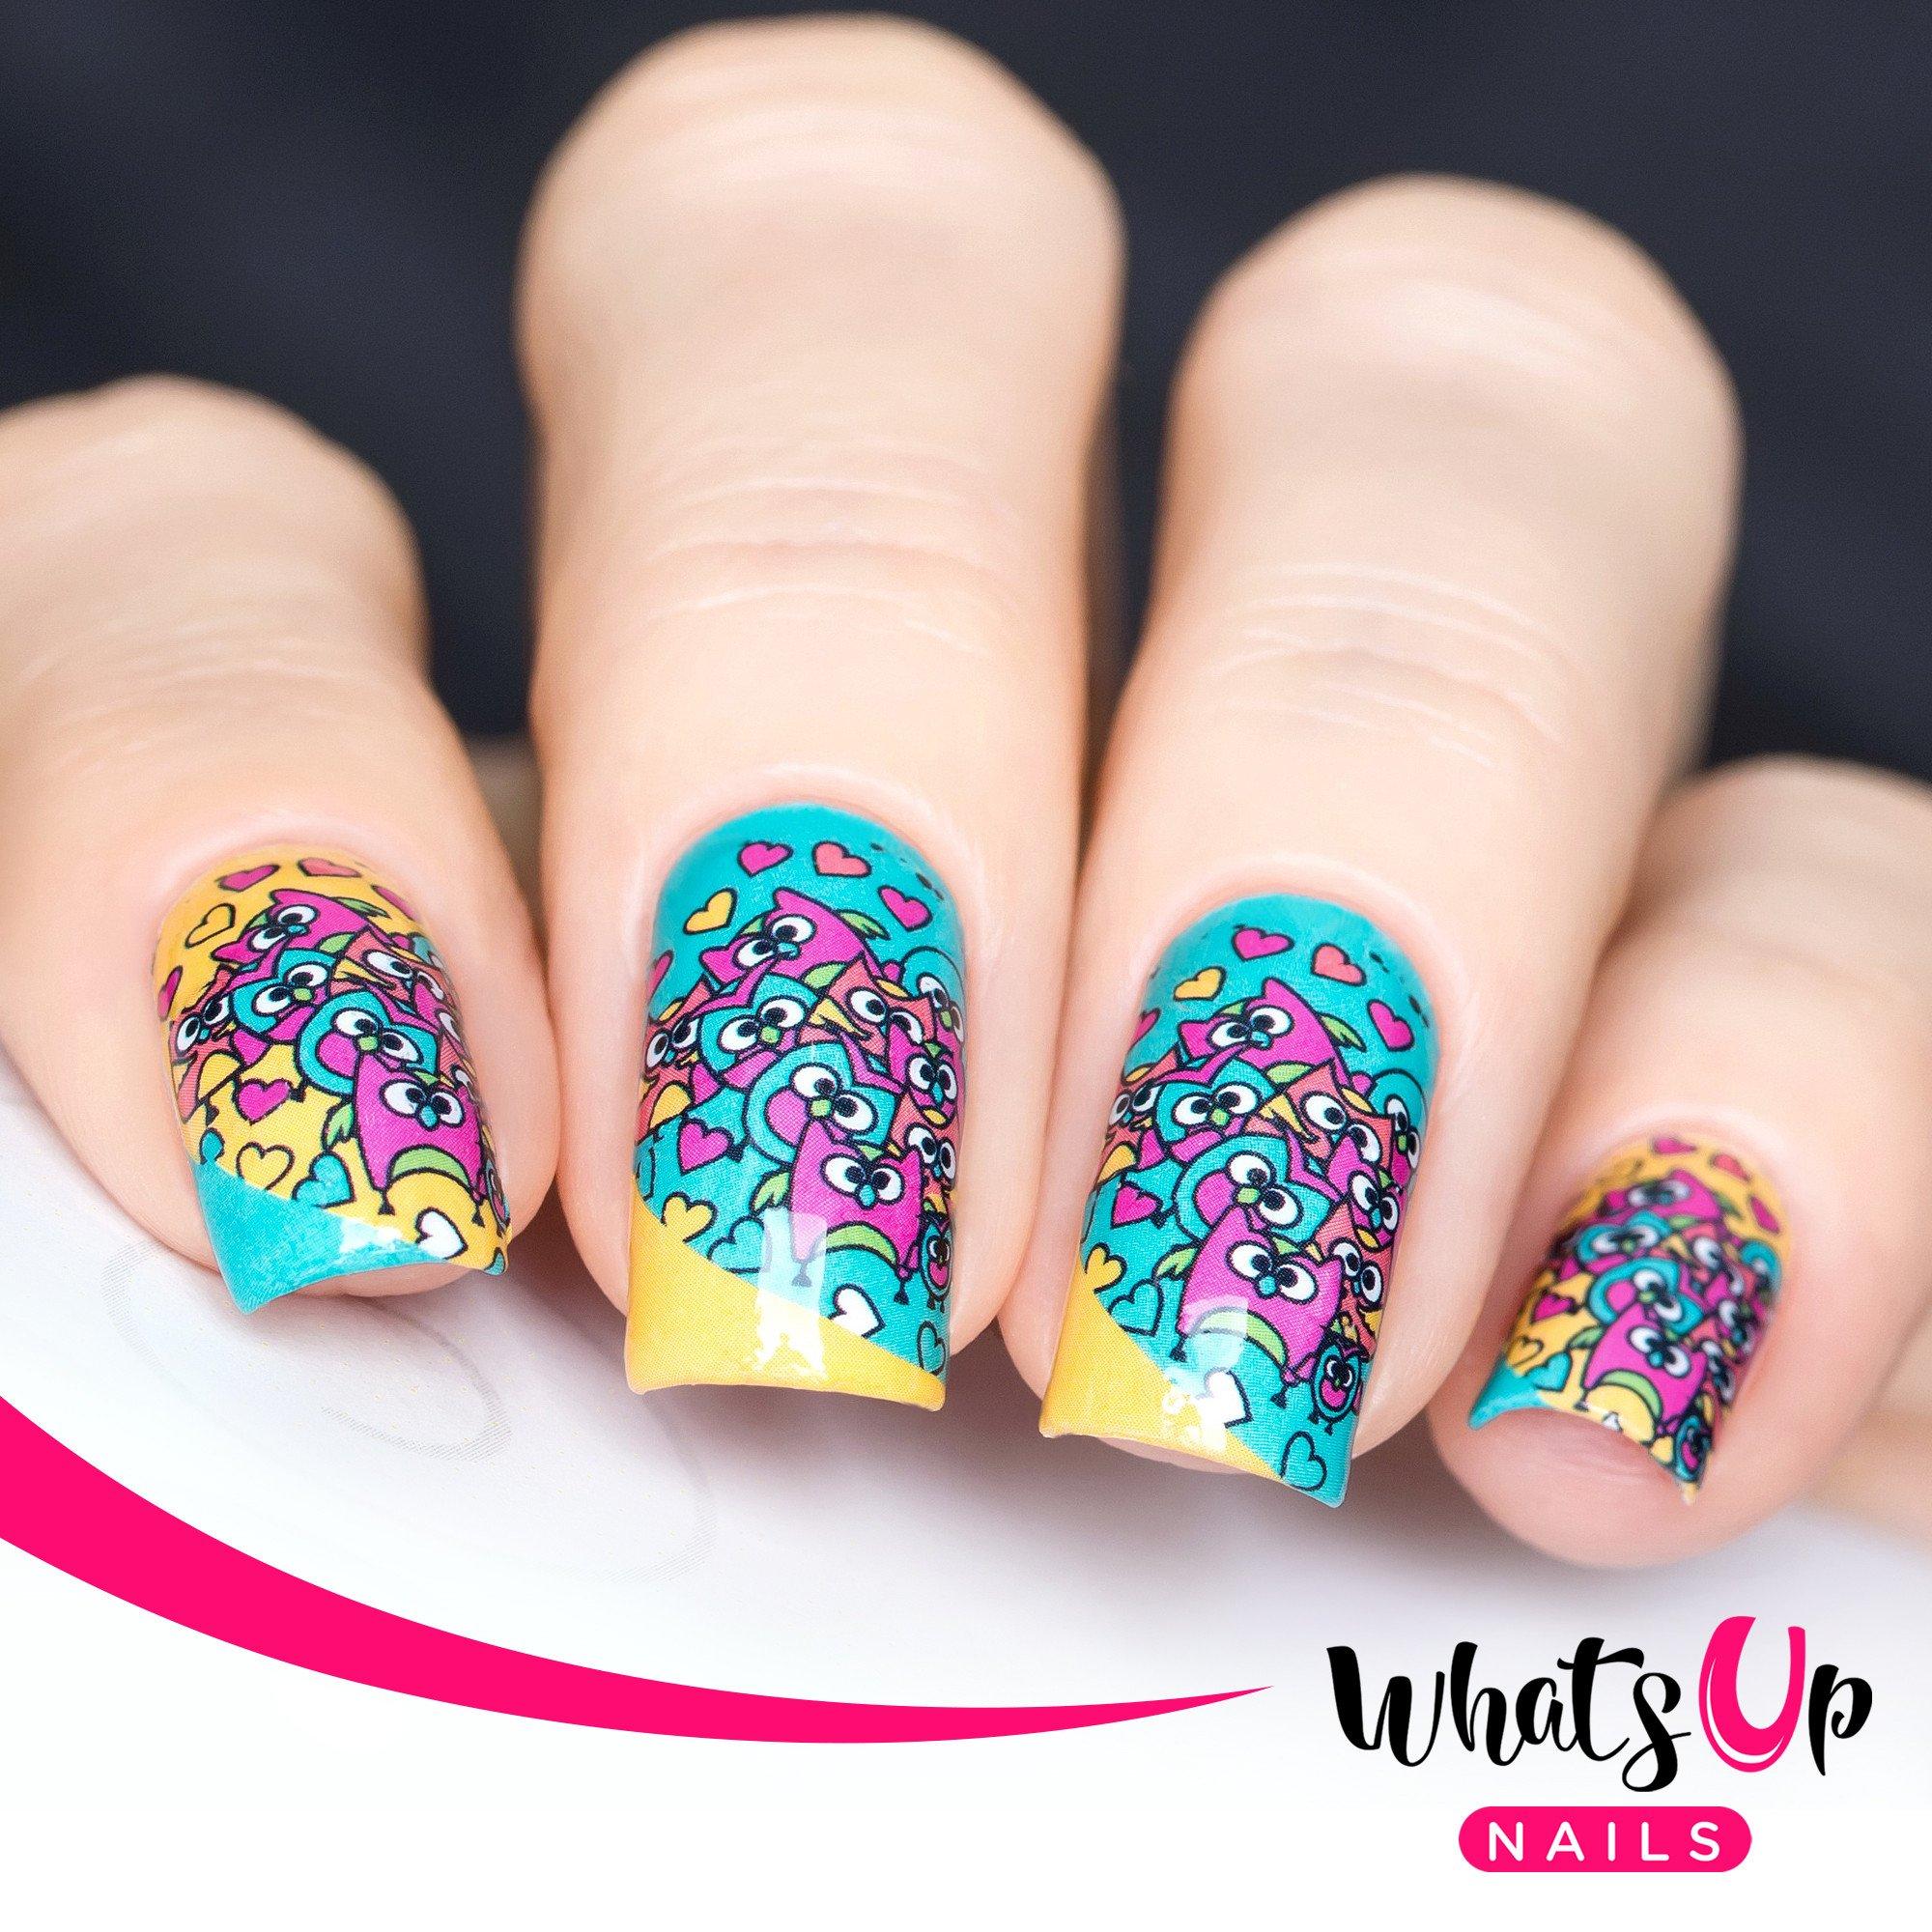 Whats Up Nails Water Decals - Nail-Artisan